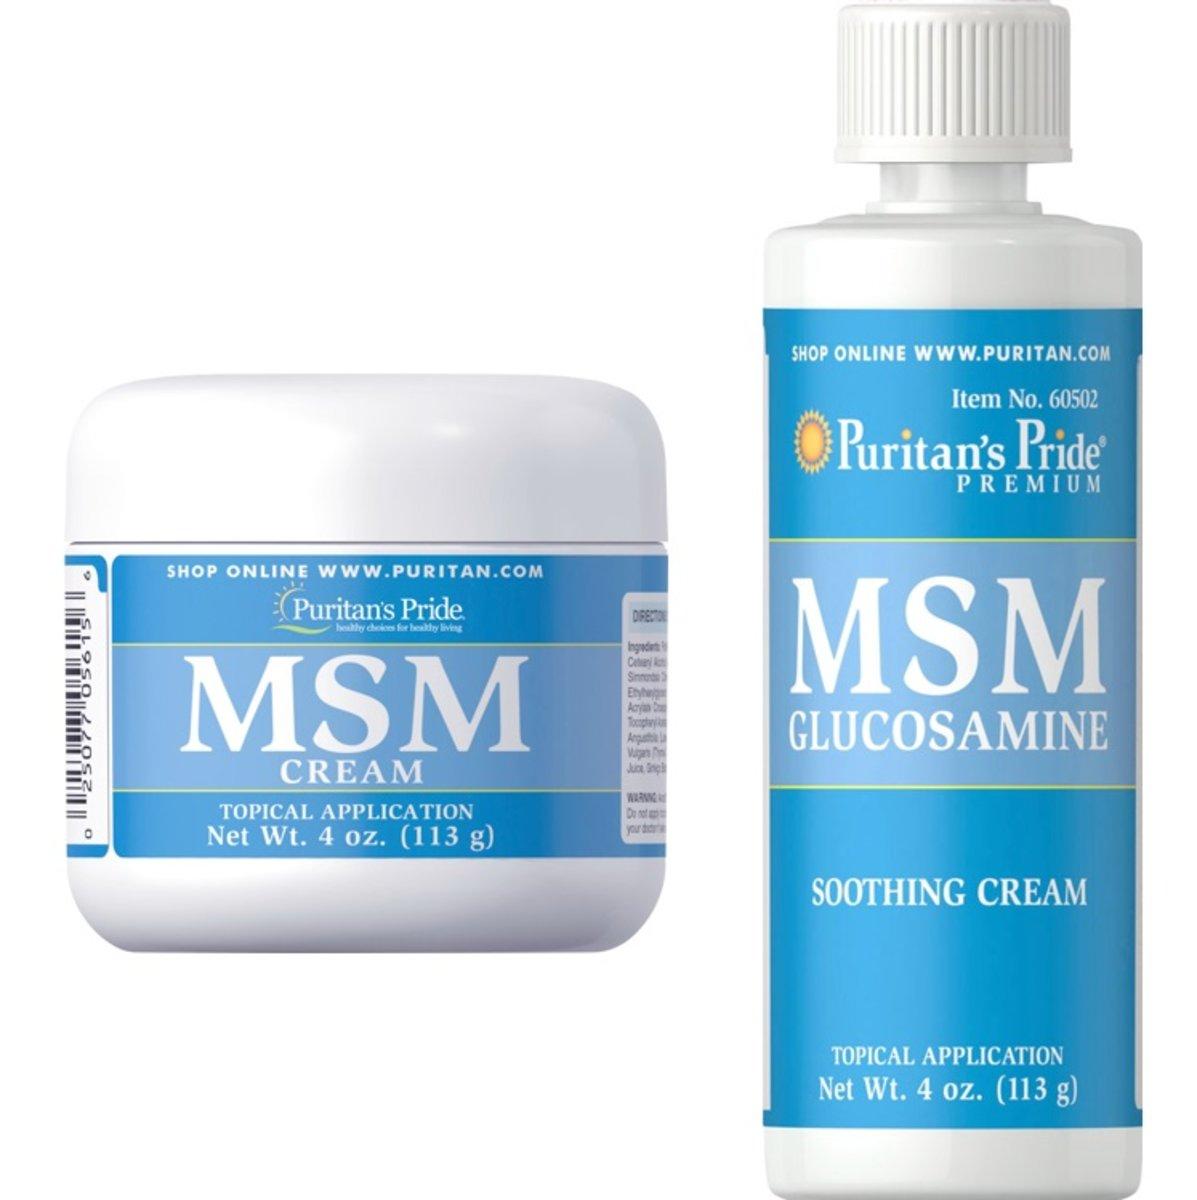 MSM CREAM 4 Oz(EXP: 4/2021)  + MSM Glucosamine Cream 4 Oz(EXP:1/21)